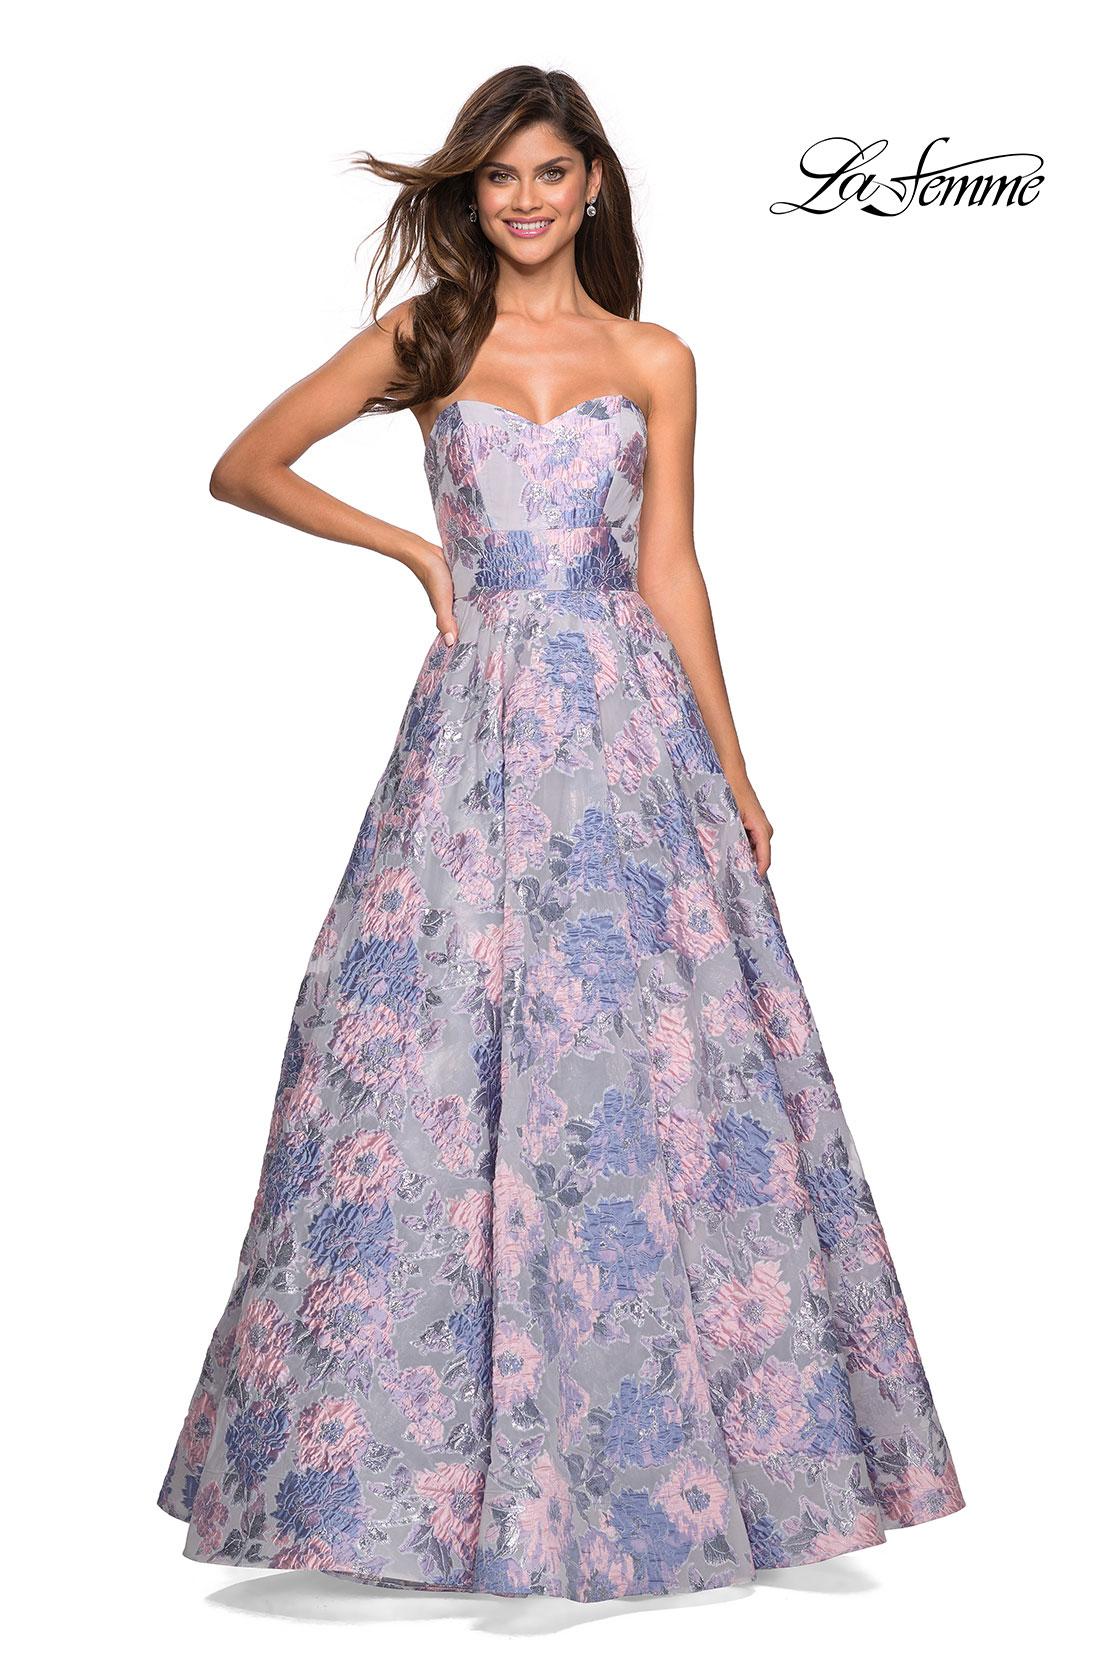 La Femme Prom Dresses Style 27507